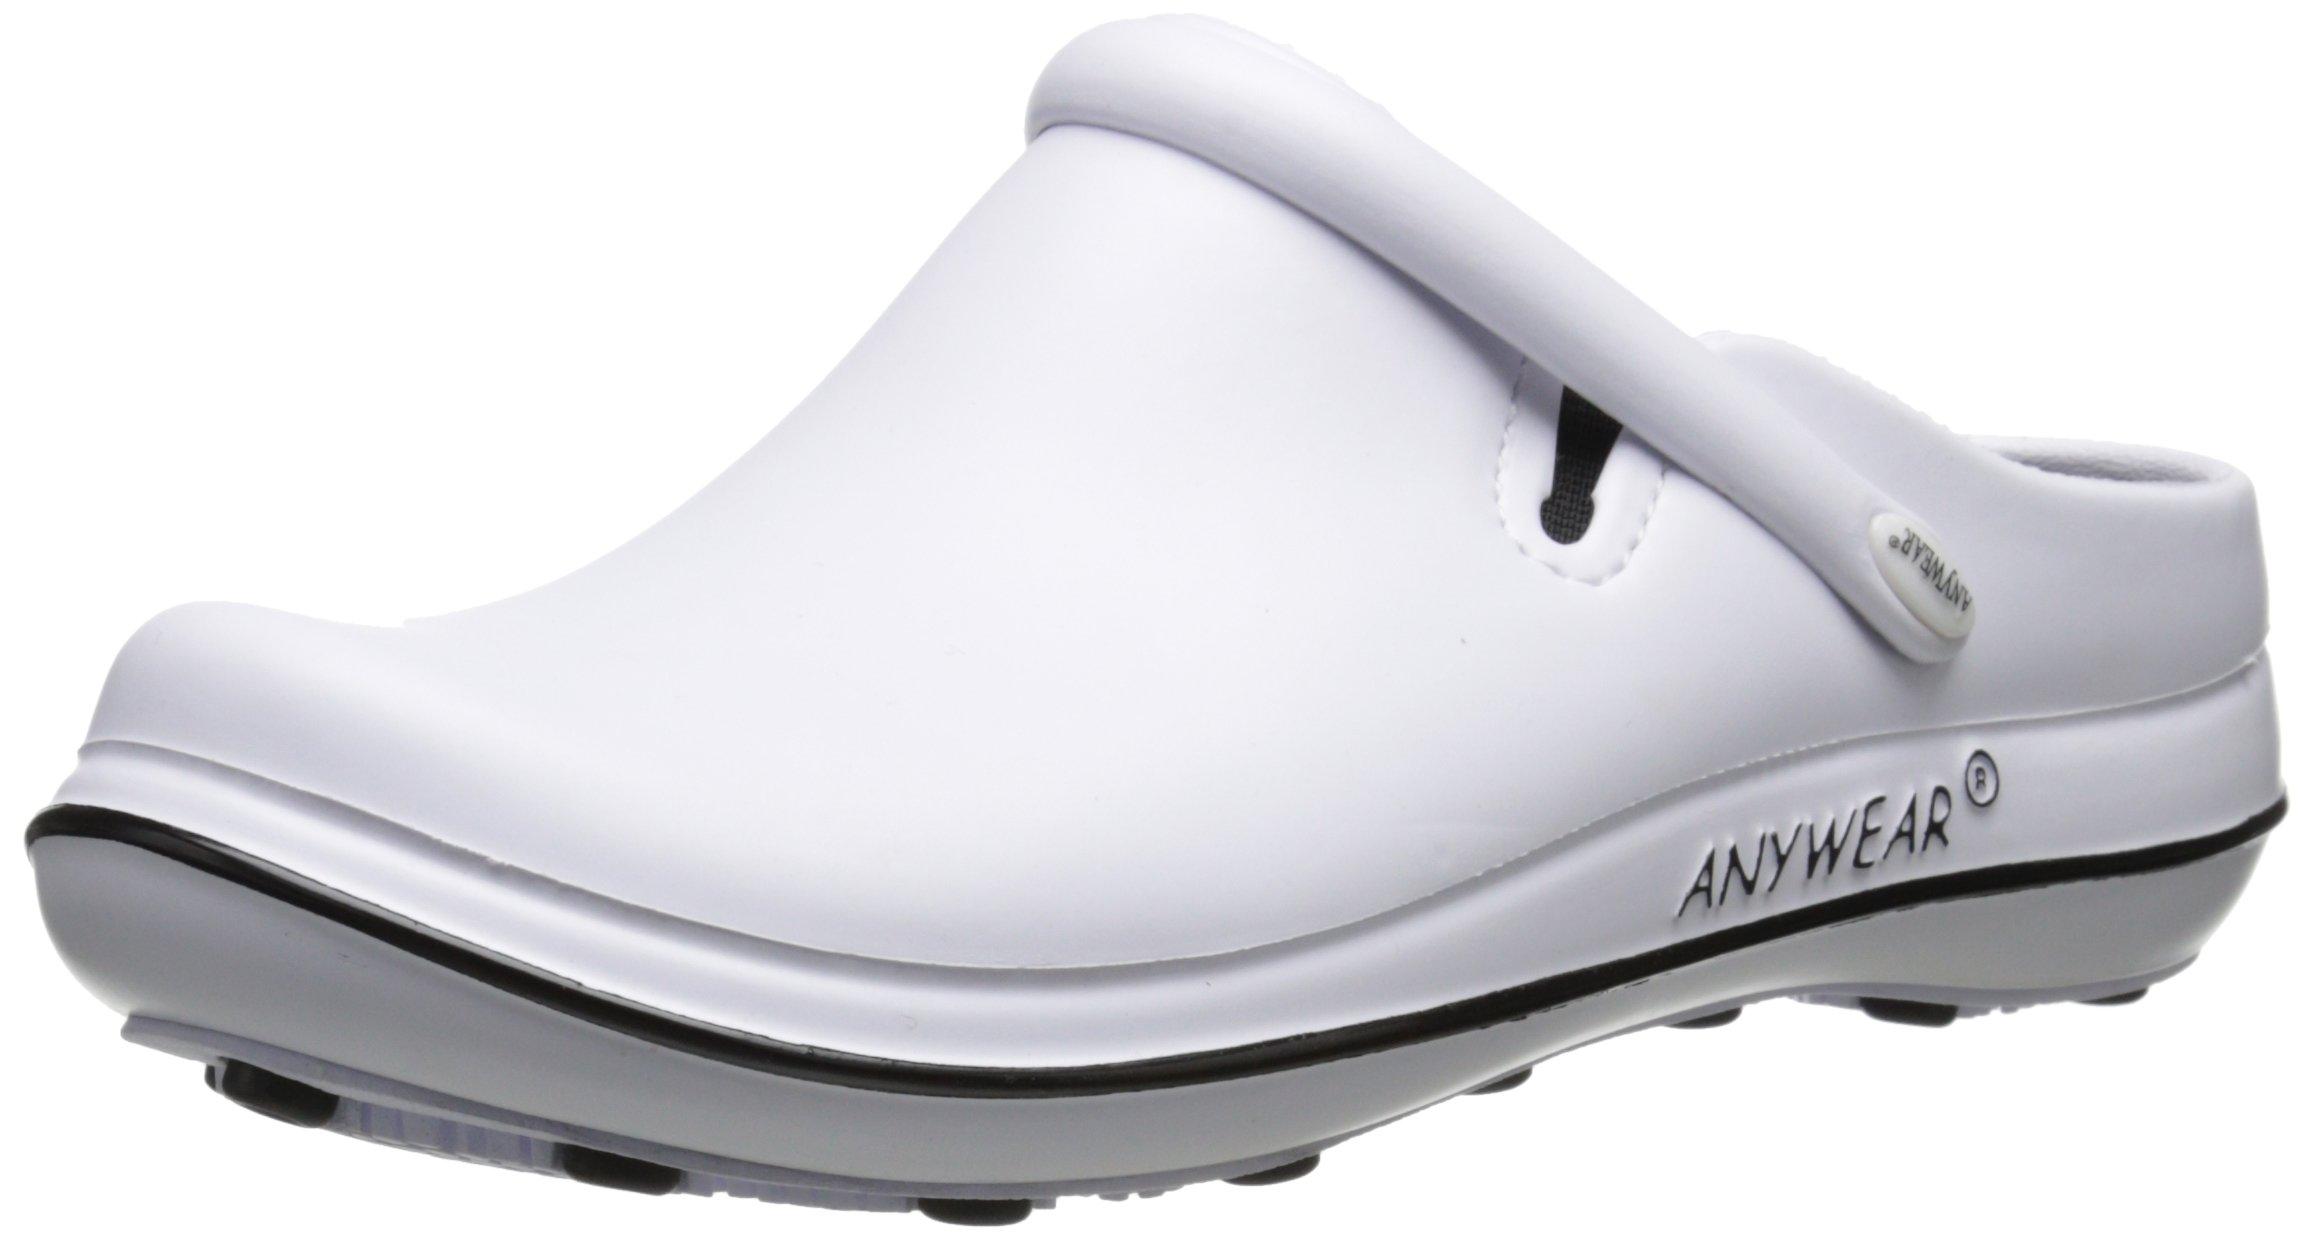 Anywear Women's Alexis Work Shoe, White/Black, 5 M US